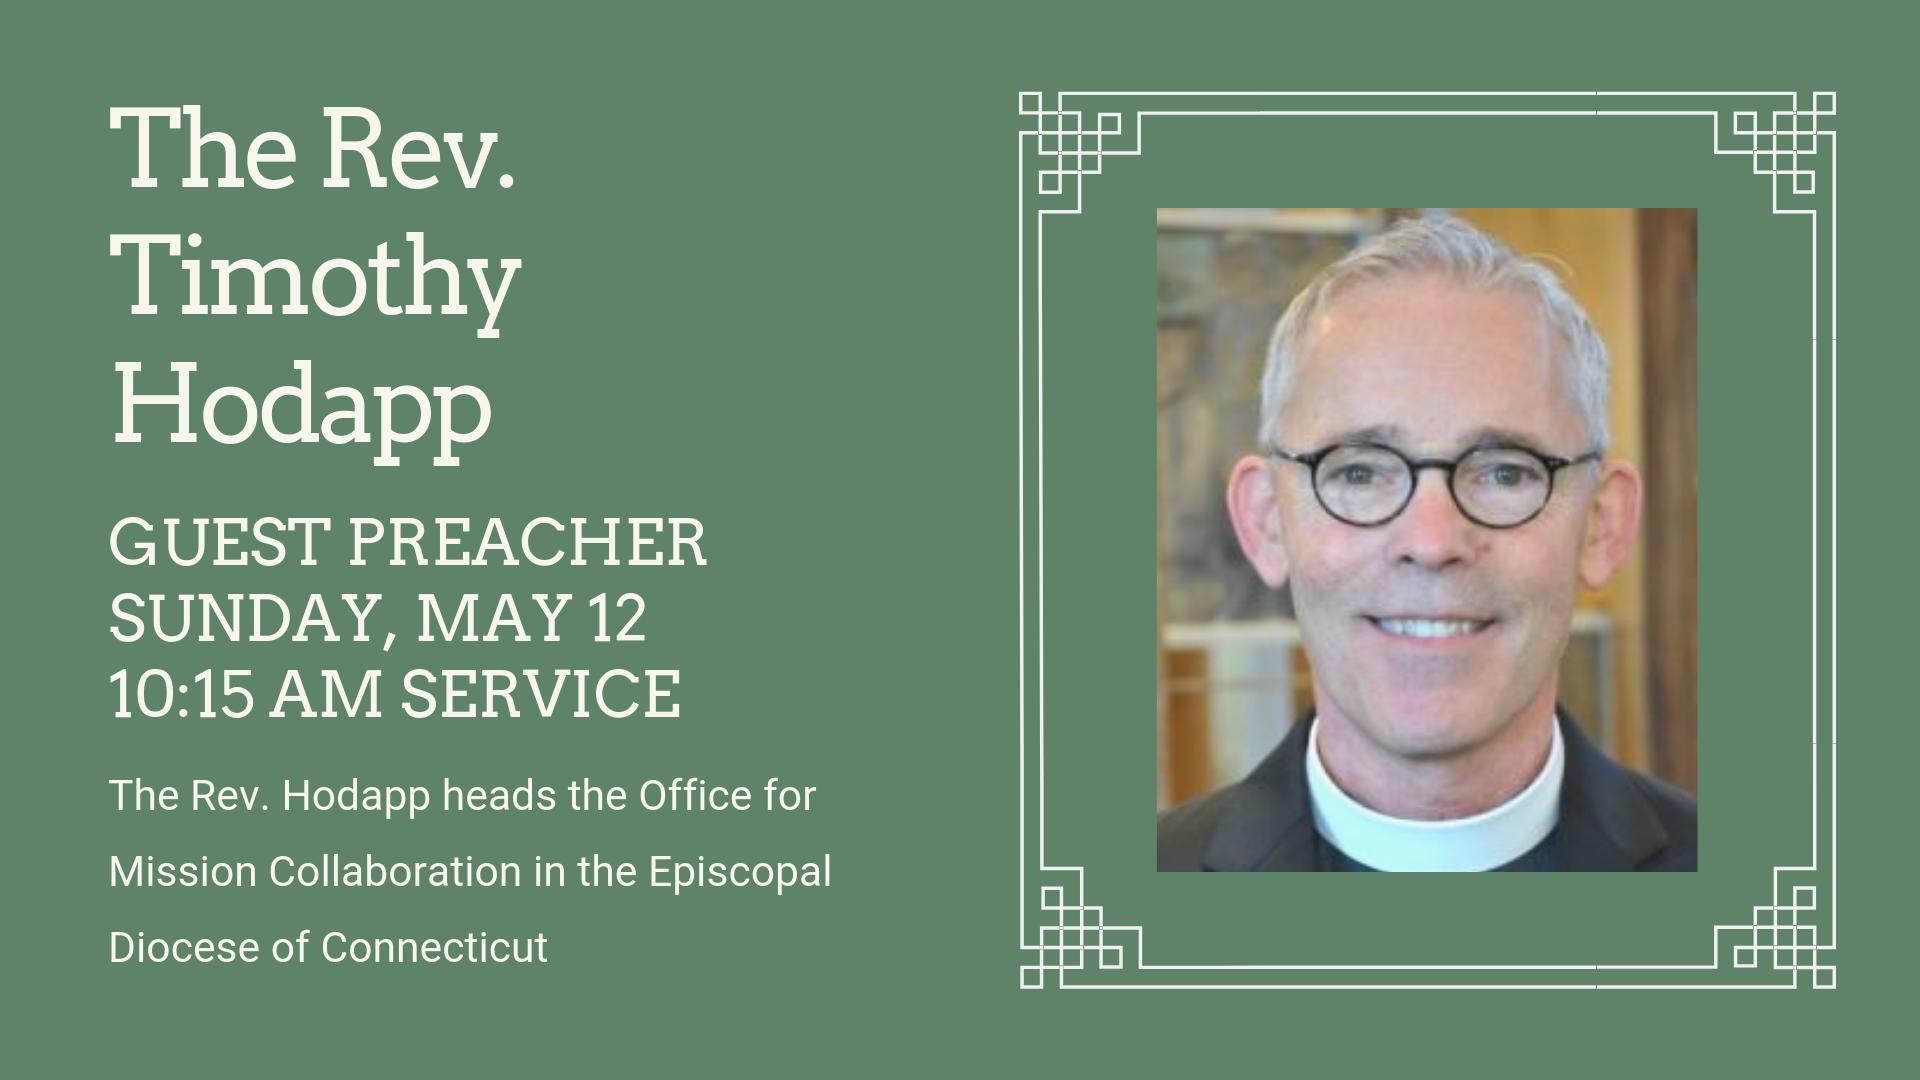 The Rev. Timothy Hodapp (1).png